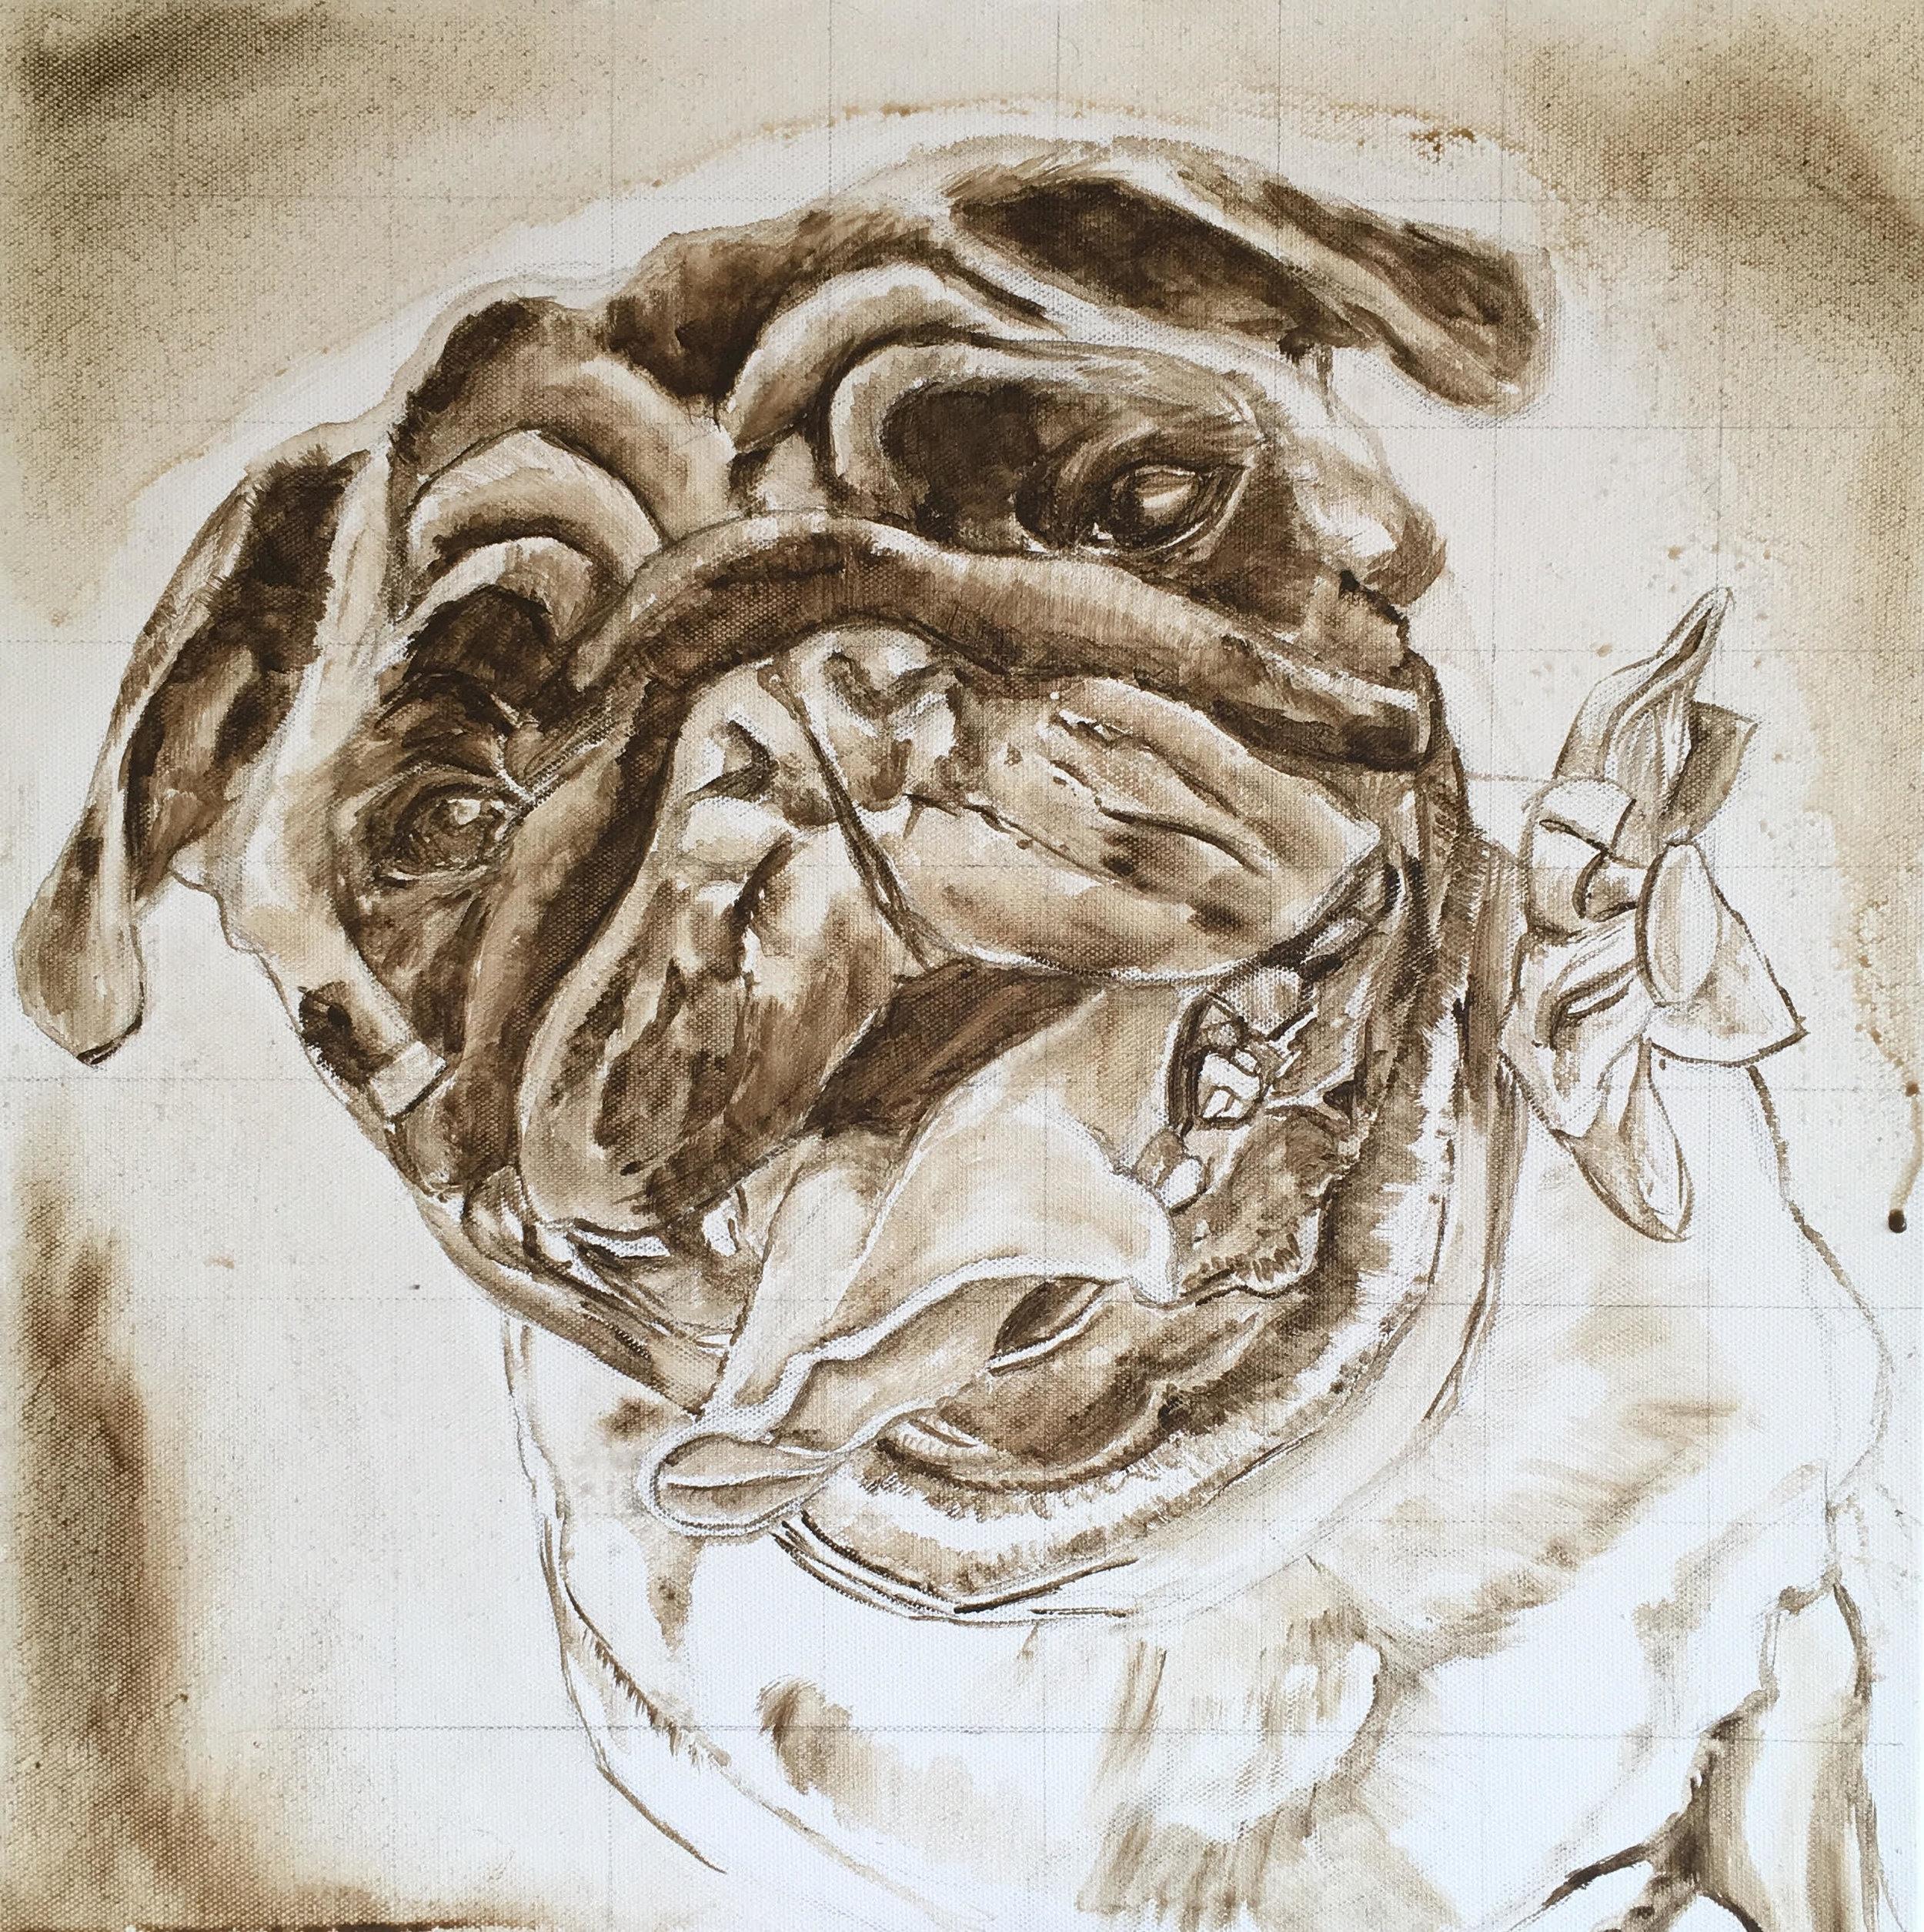 PUD DOG CUSTOM PORTRAIT. TONAL LAYER BY OPAL PASTRO ART